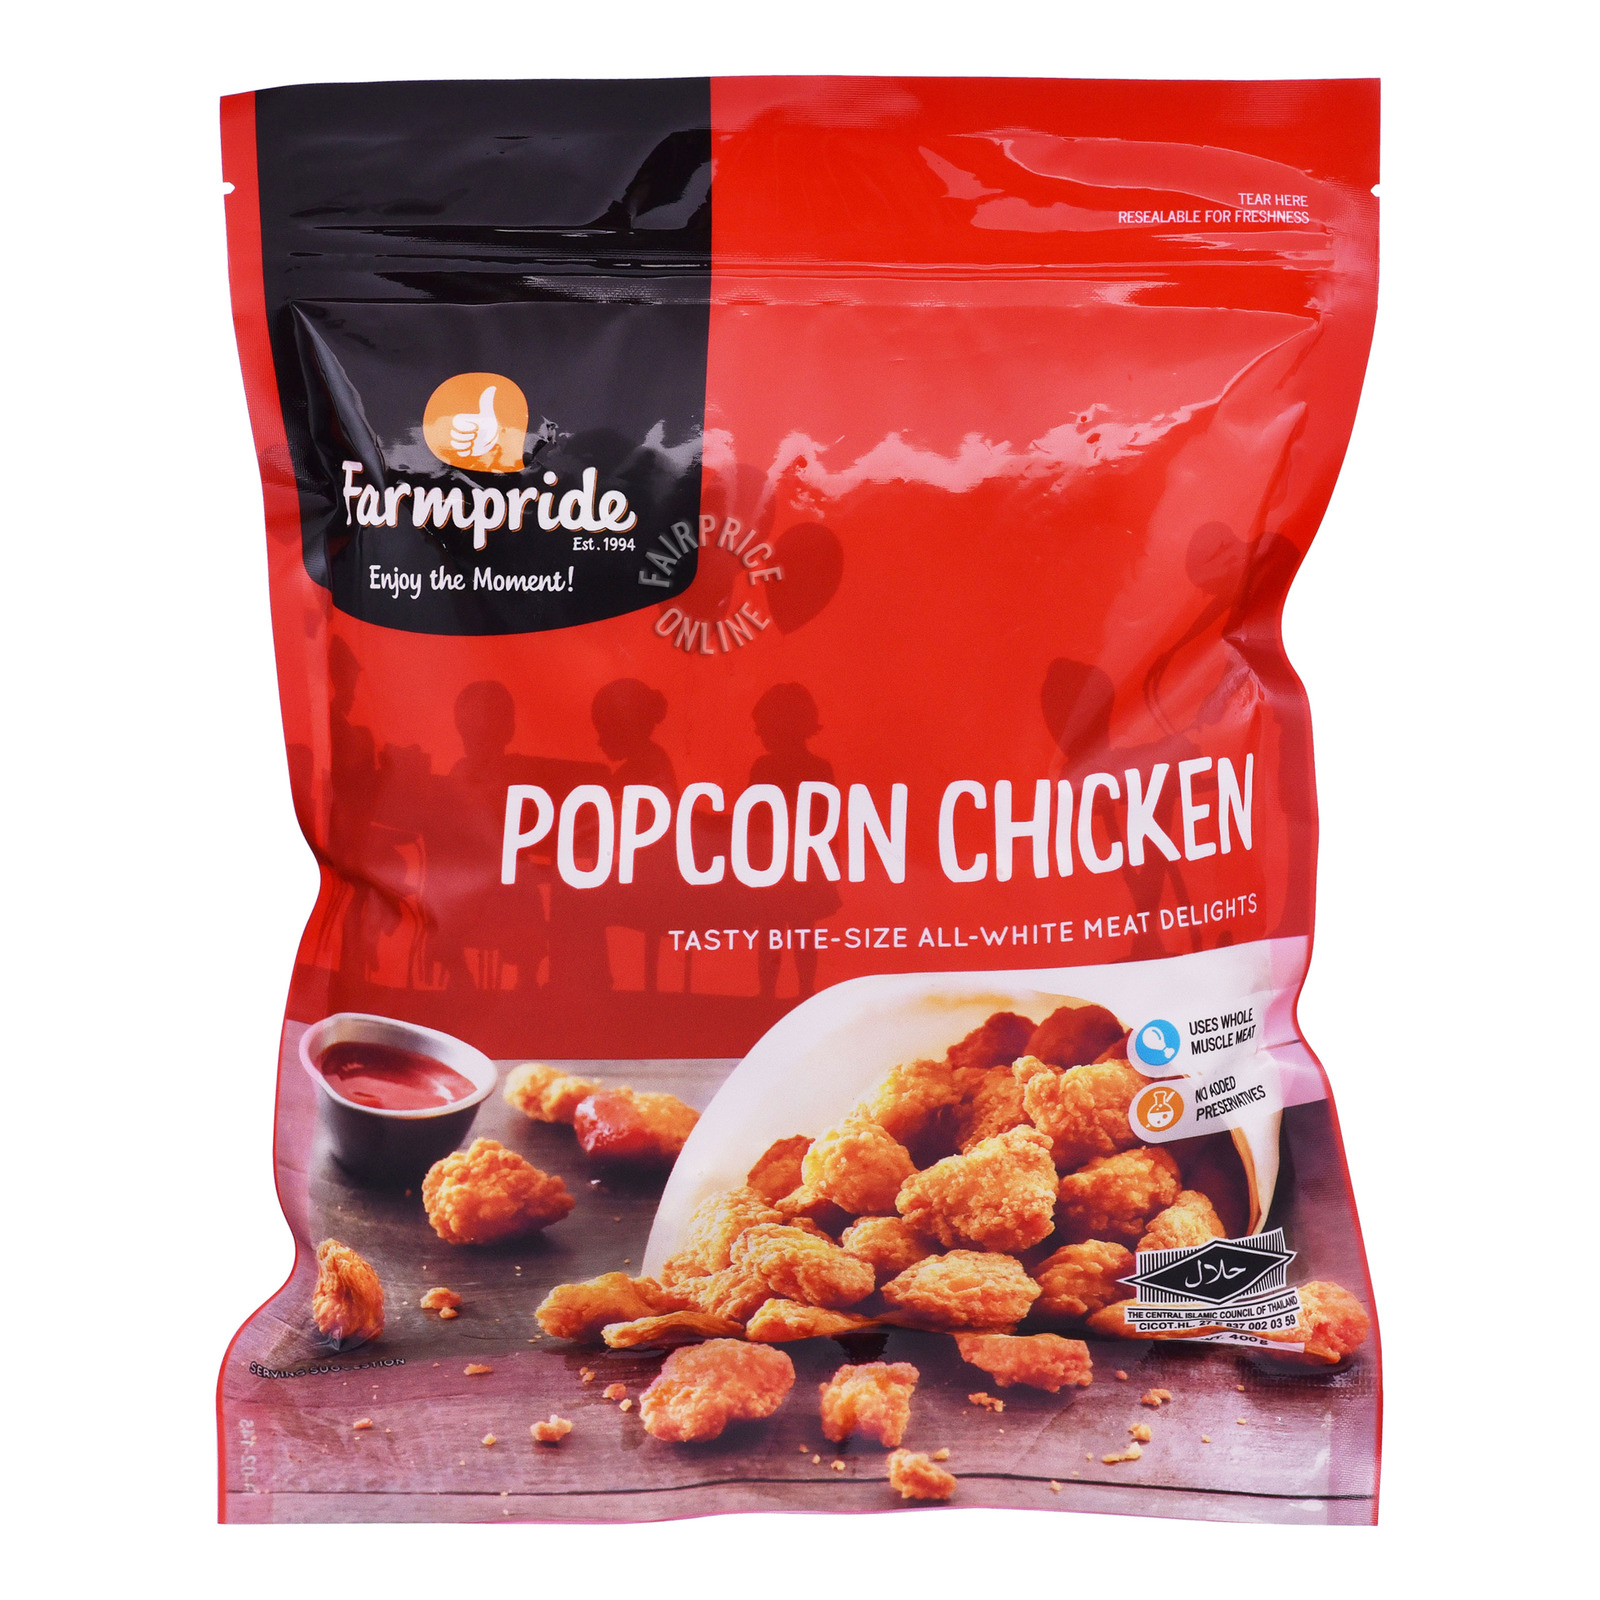 Farmpride Frozen Popcorn Chicken